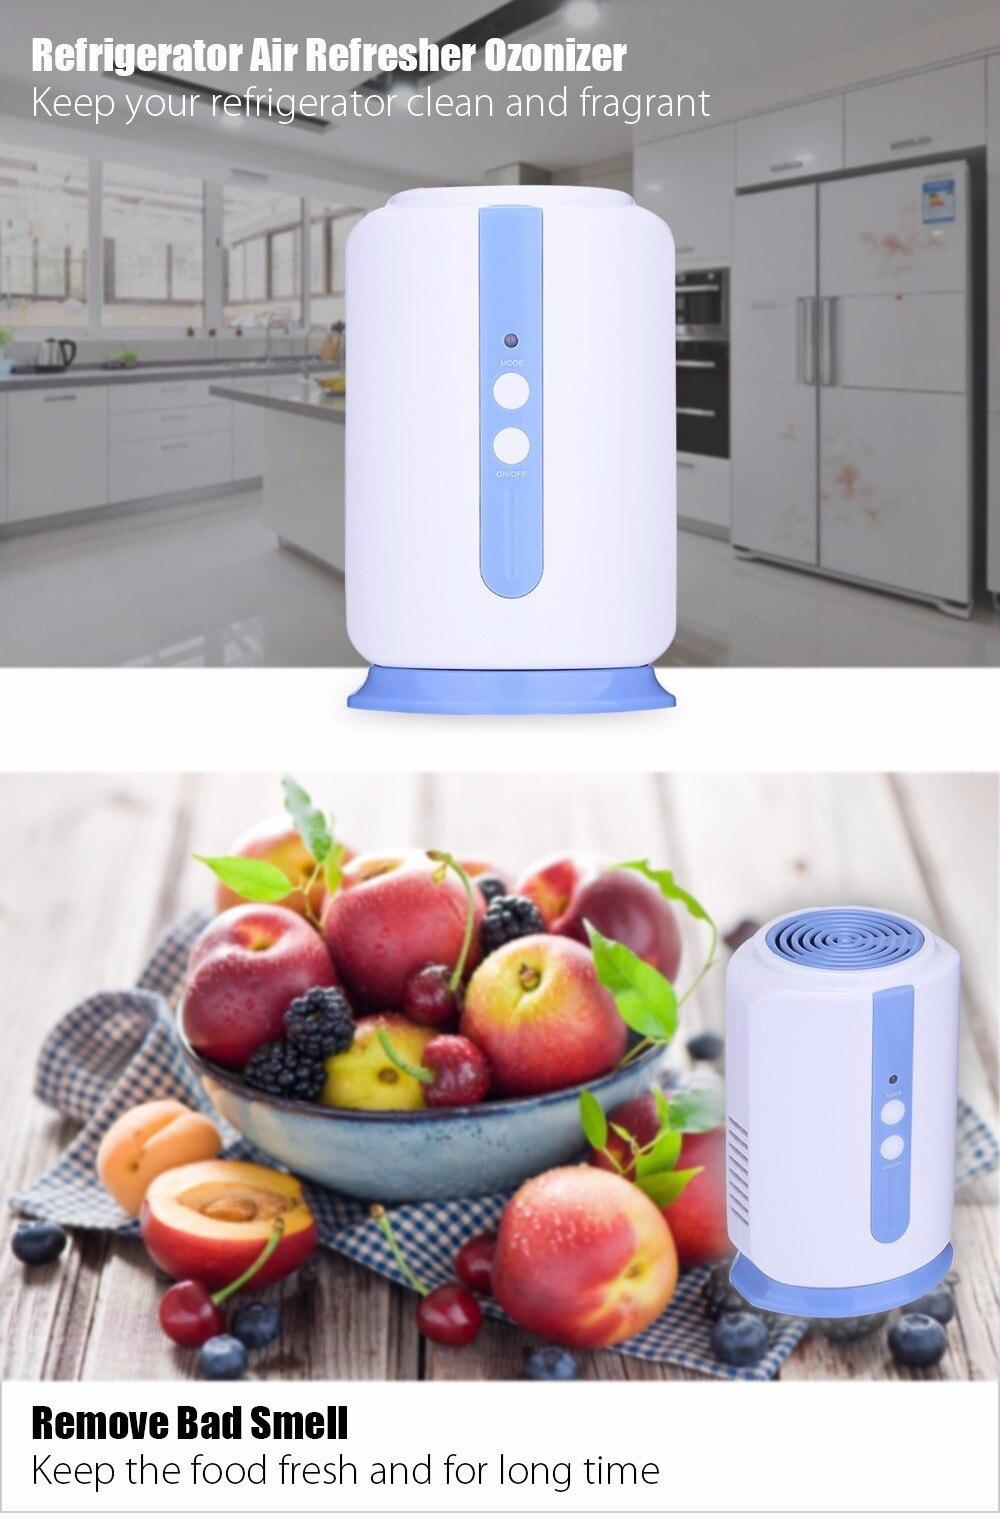 Ozone Generator Air Purifier For Home Car Food Fruit Vegetables Wardrobe O3  Ionizer Disinfect Sterilizer Fresh Air Purify